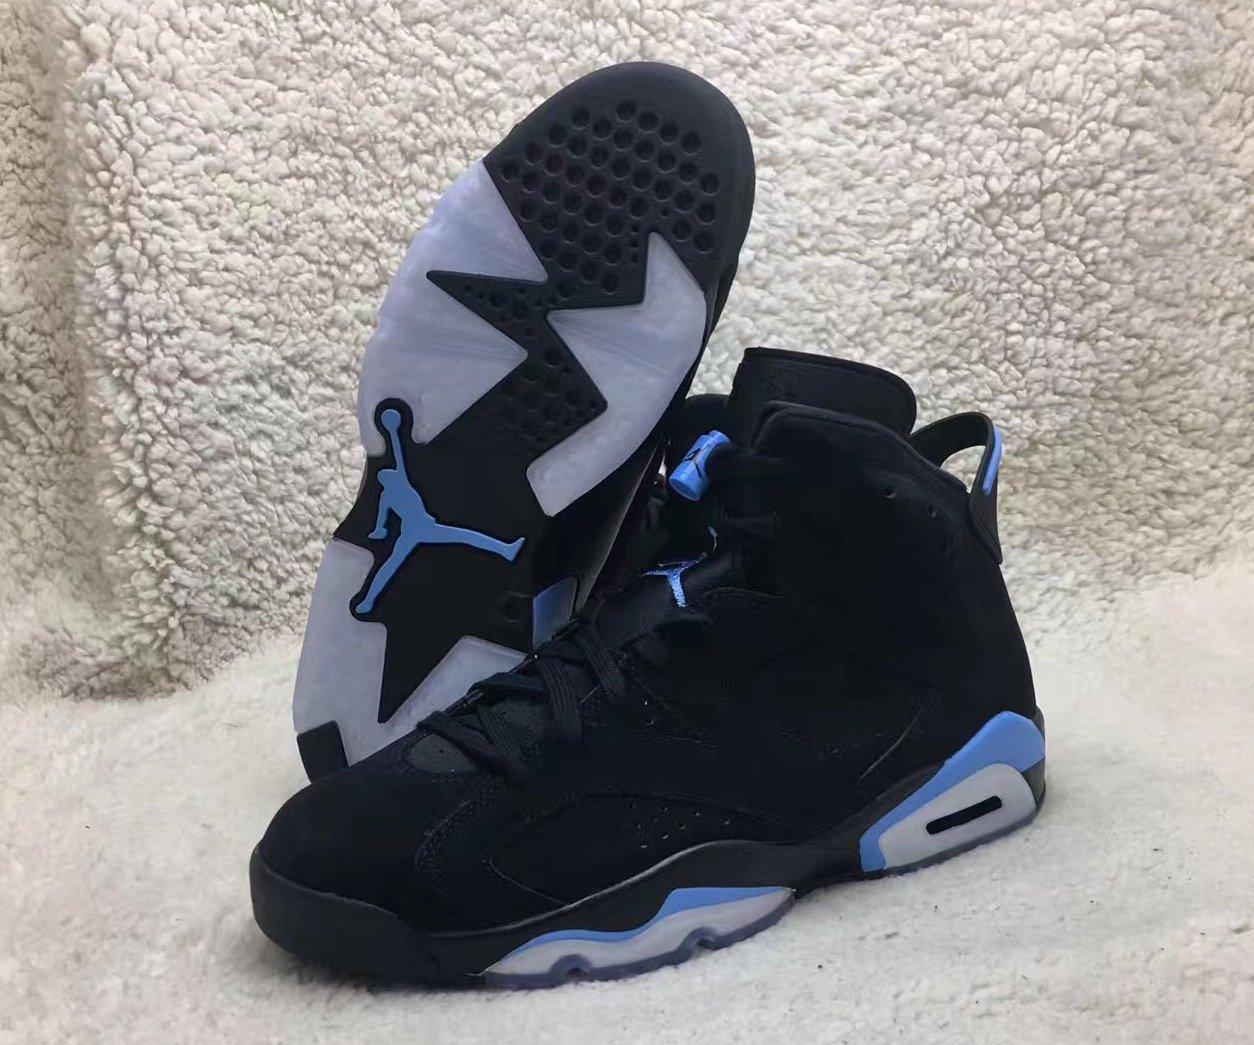 f8e7557463b8c6 Air Jordan 6 UNC Black University Blue 384664-006 Release Date ...